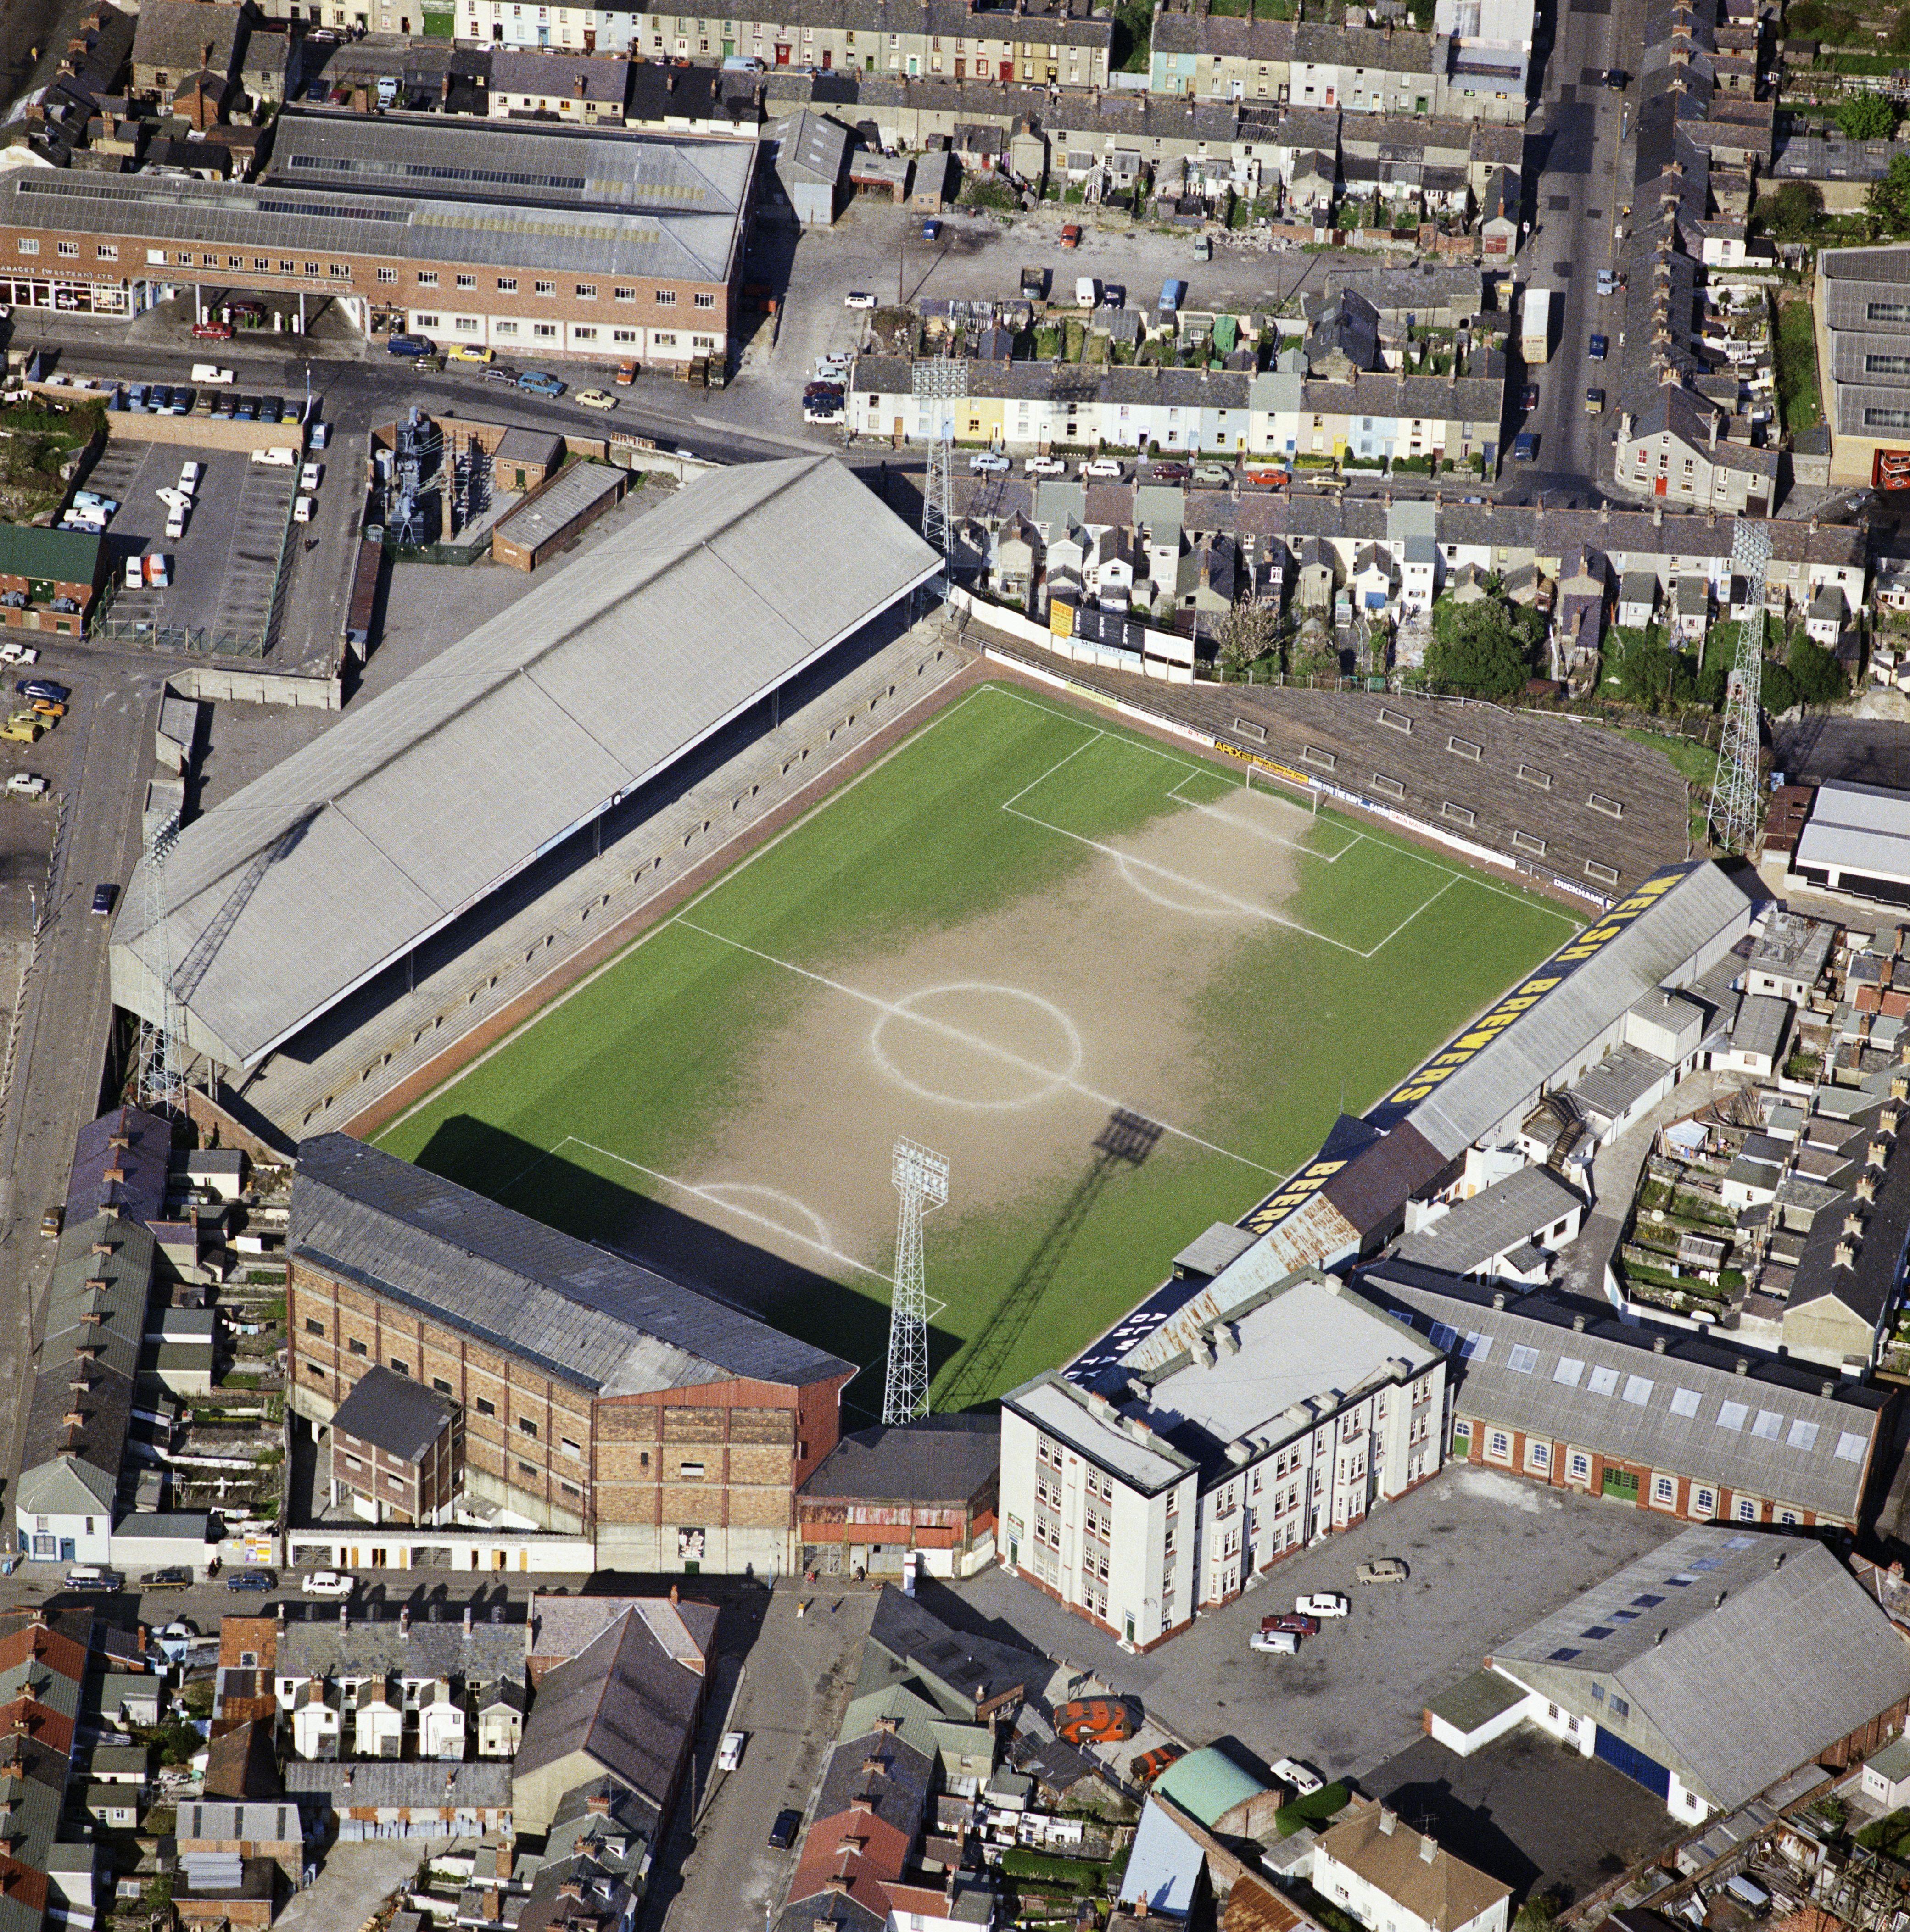 Swansea S Vetch Field 1975 Stadium Pics Swansea City Football Stadiums